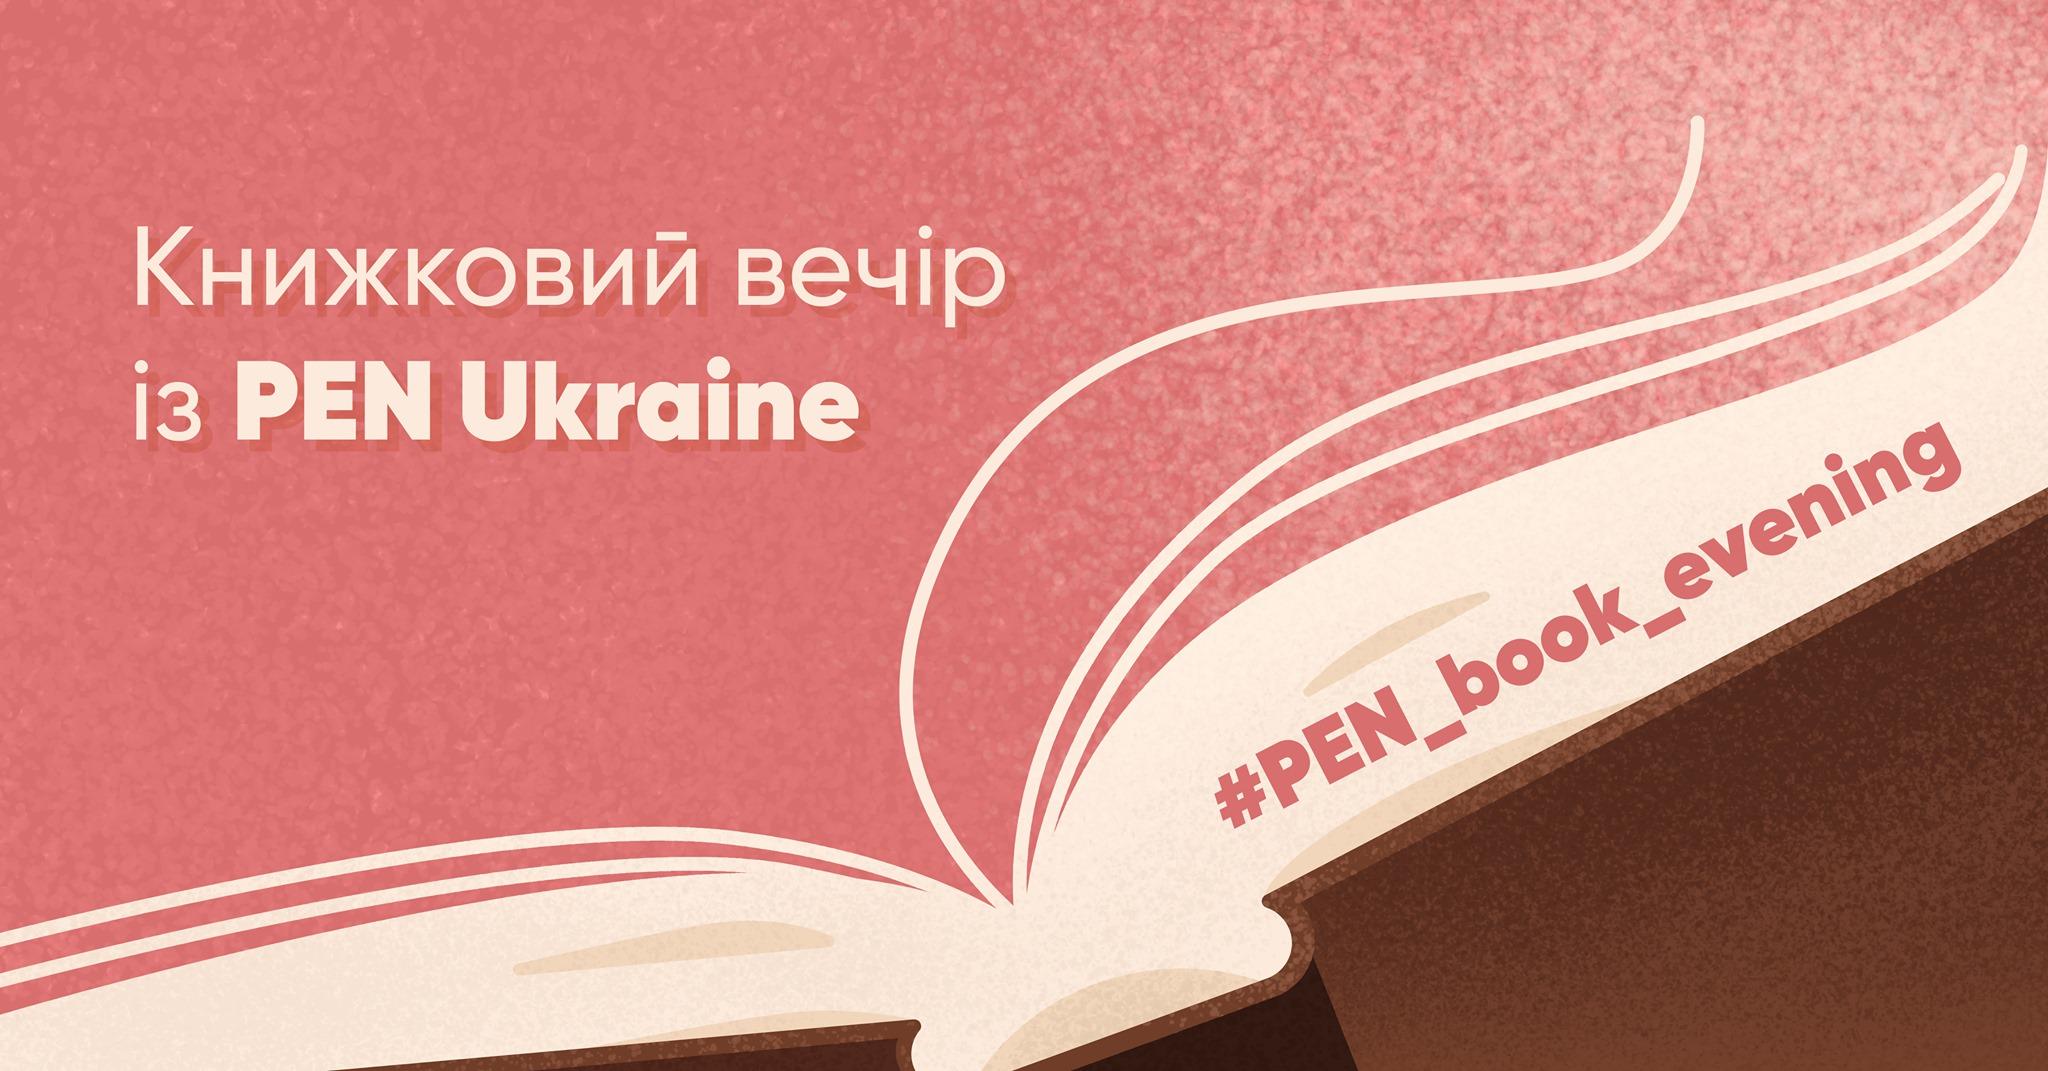 Книжковий вечір із PEN Ukraine